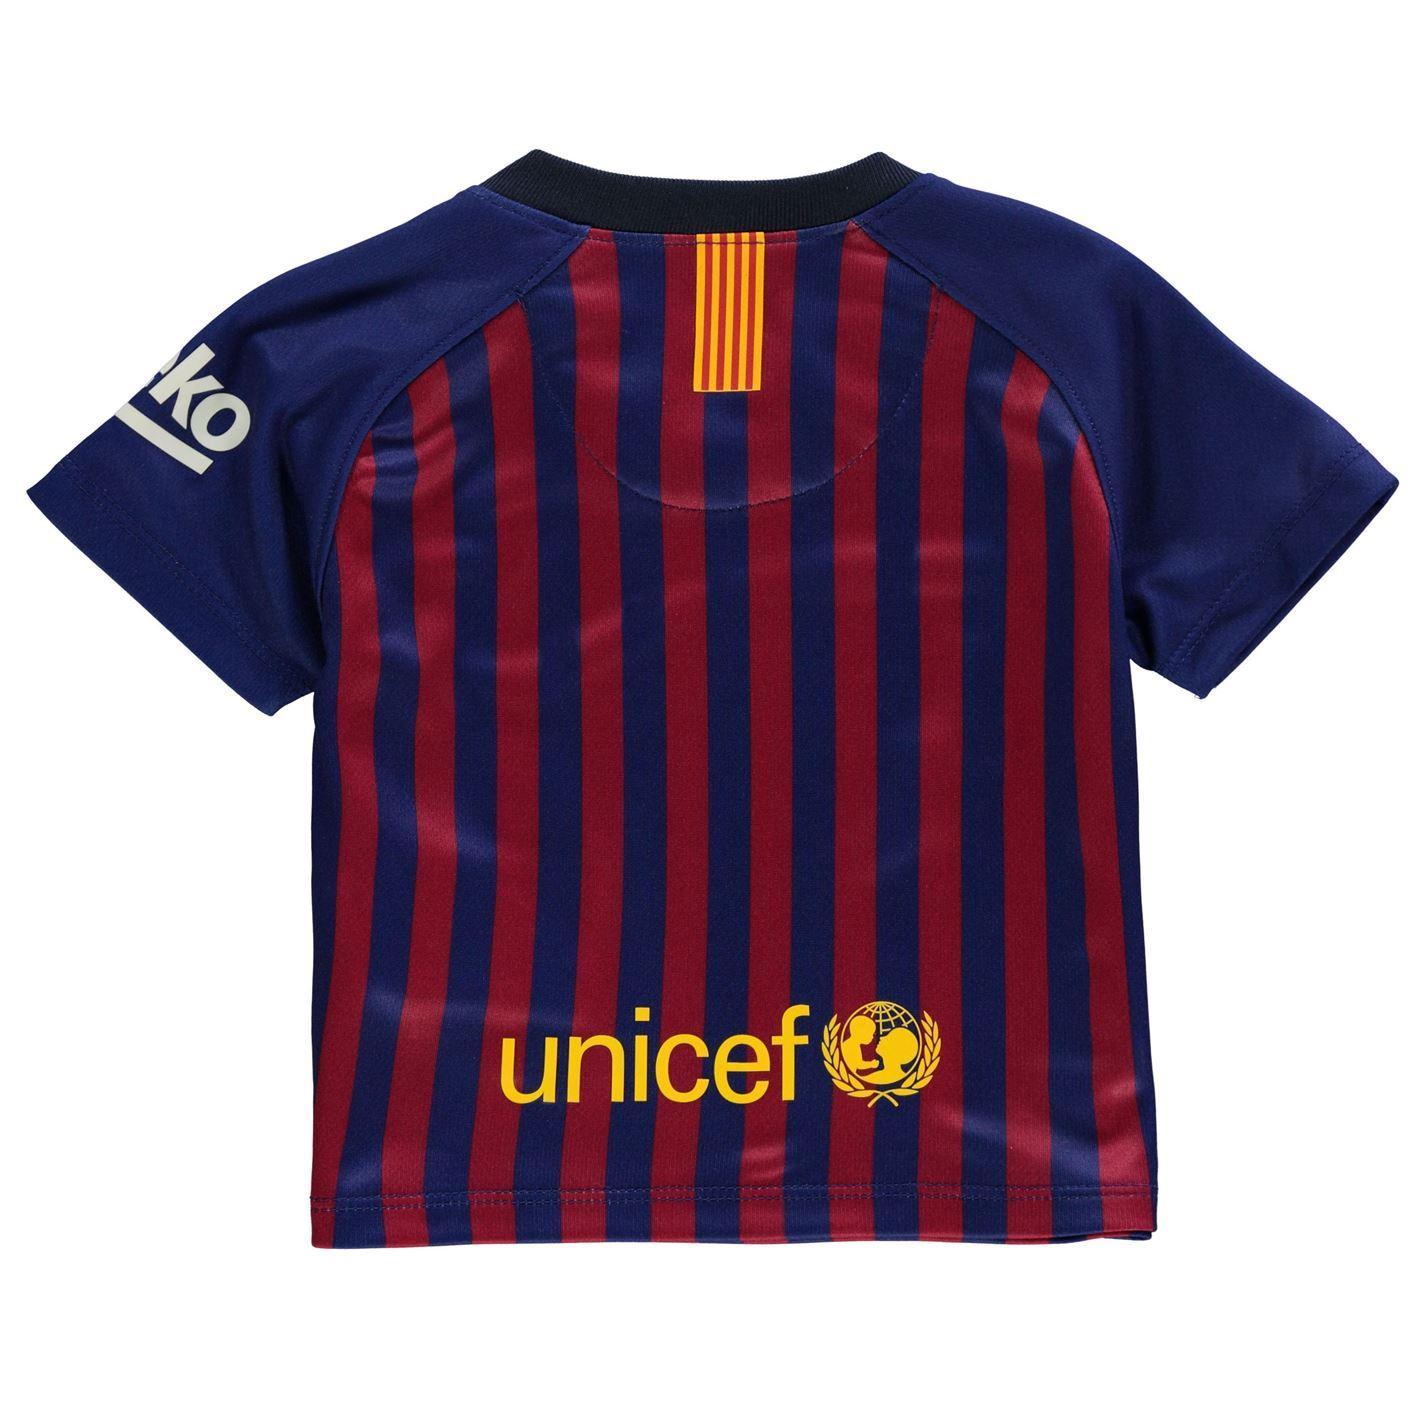 ... Nike Barcelona Home Baby Kit 2018 2019 Infants Blue Football Soccer  Strip baabe4896